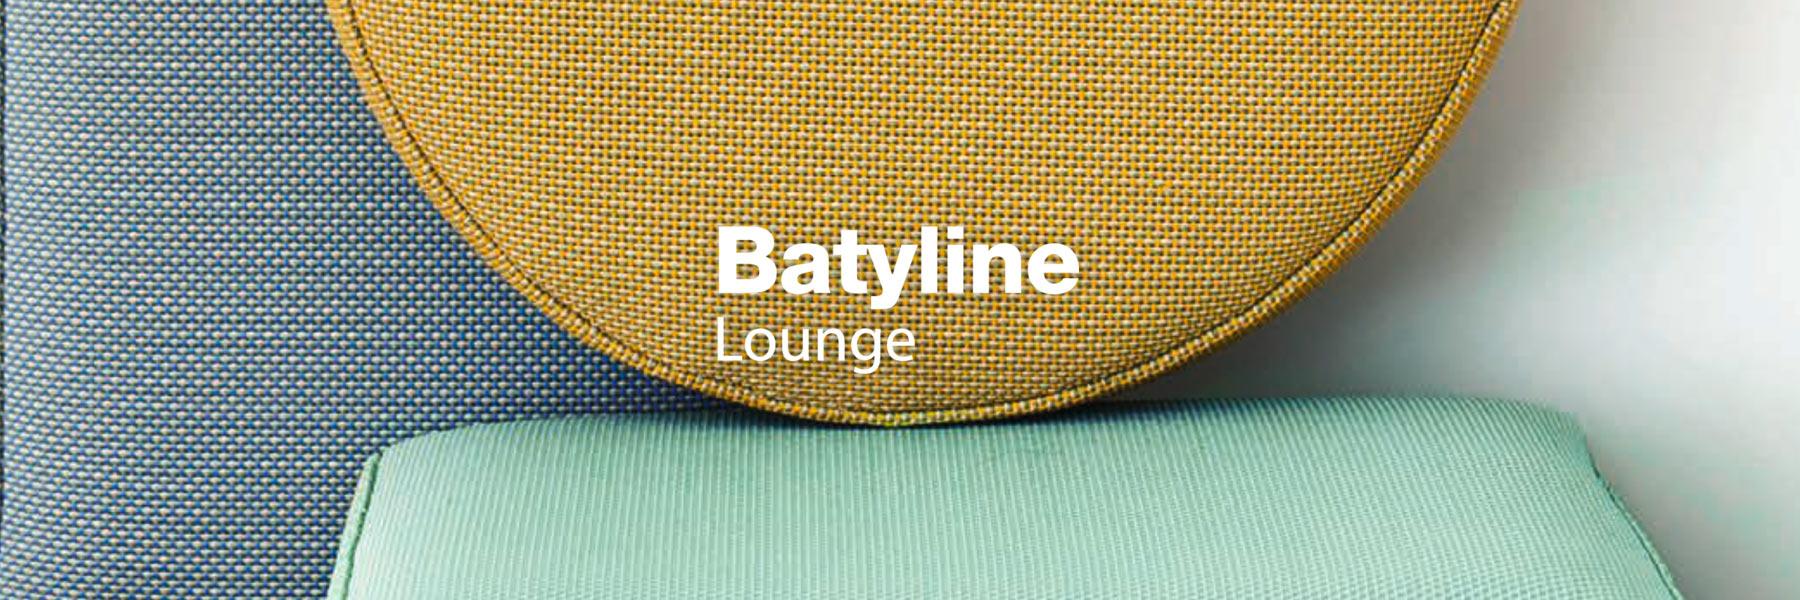 Serge Ferrari Batyline Lounge header